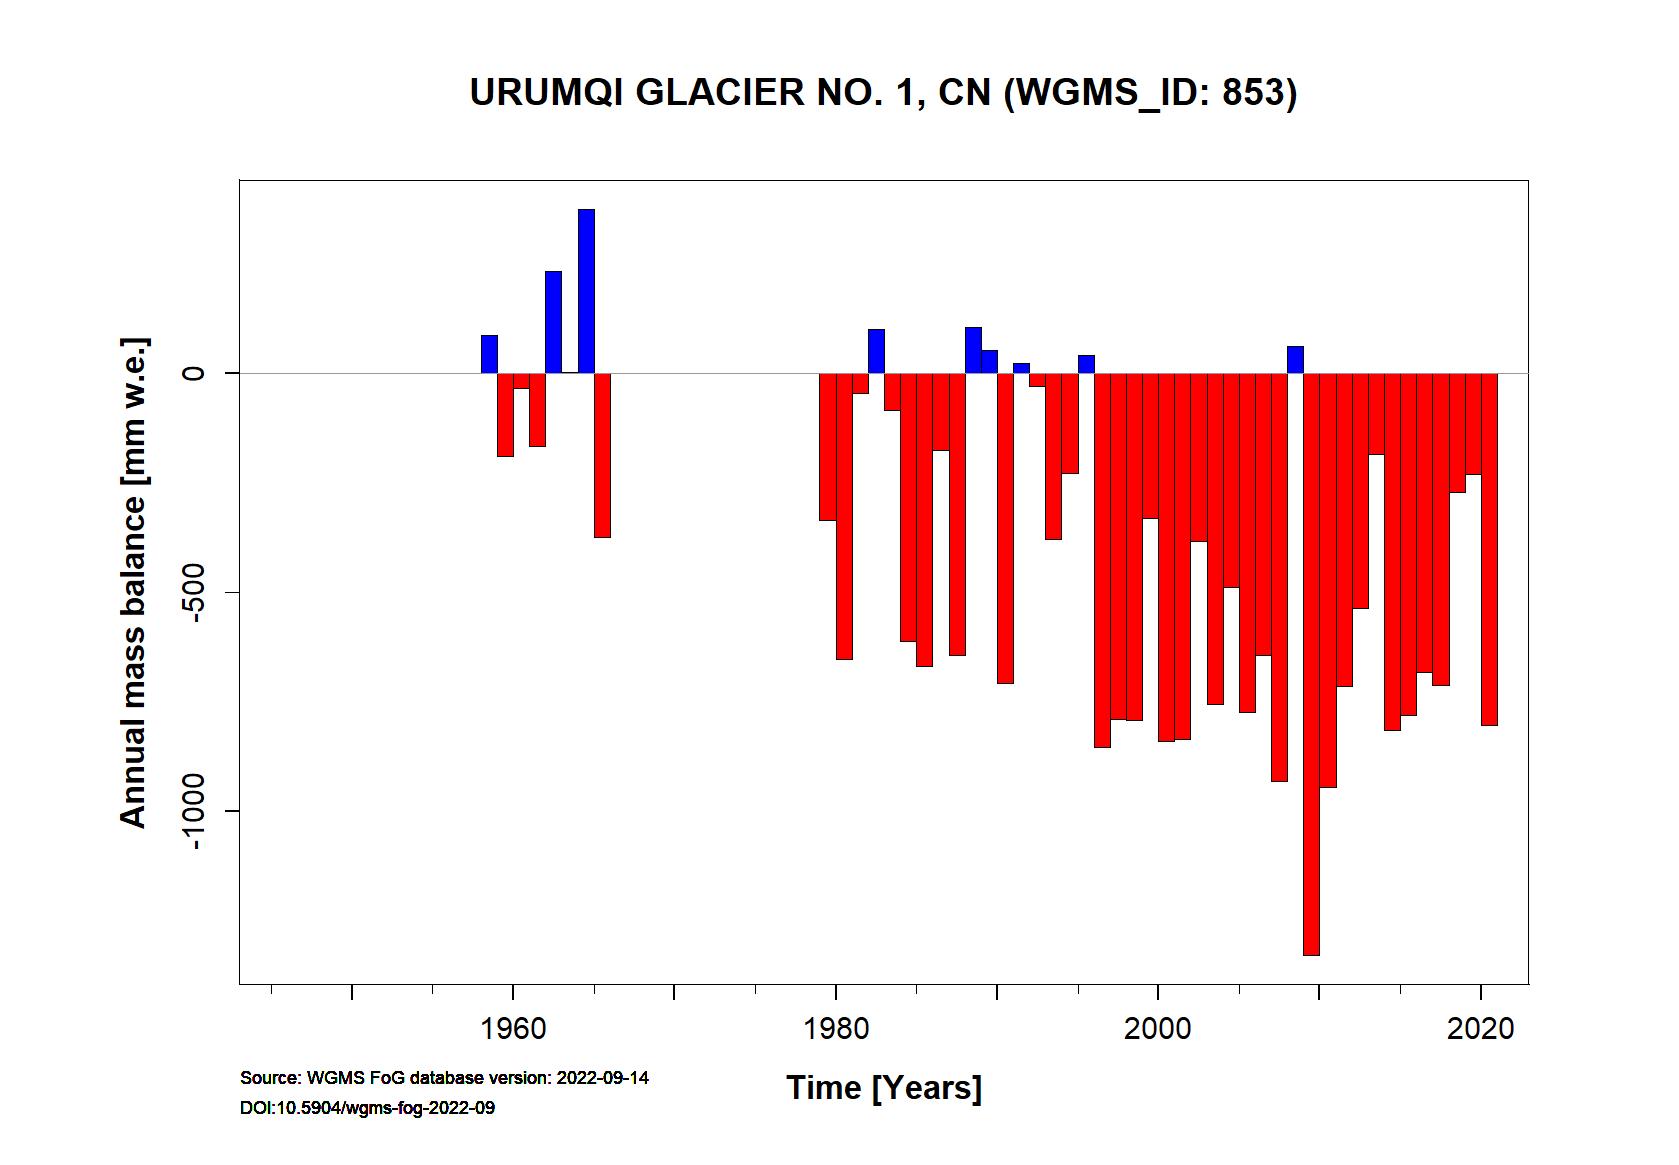 Urumqi Glacier No. 1 Annual Mass Balance (WGMS, 2016)